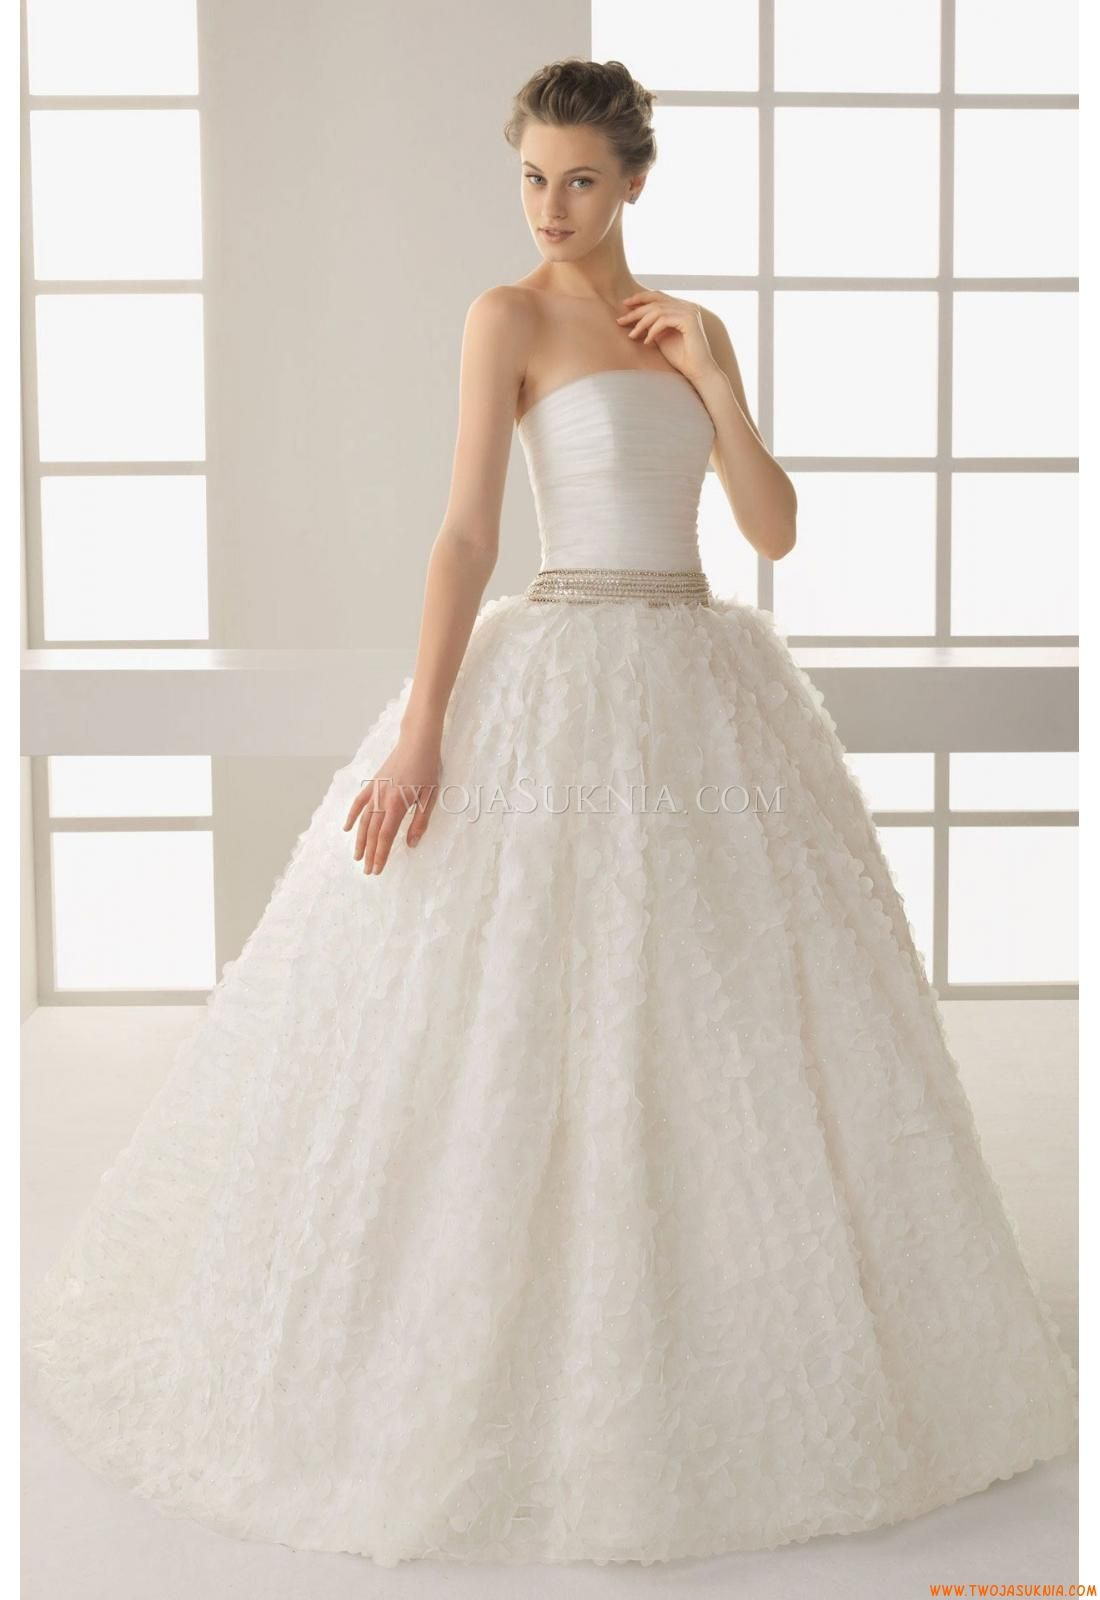 Pockets Wedding Dresses Wedding Dresses Wedding Dresses Nz Inexpensive Bridesmaid Dresses